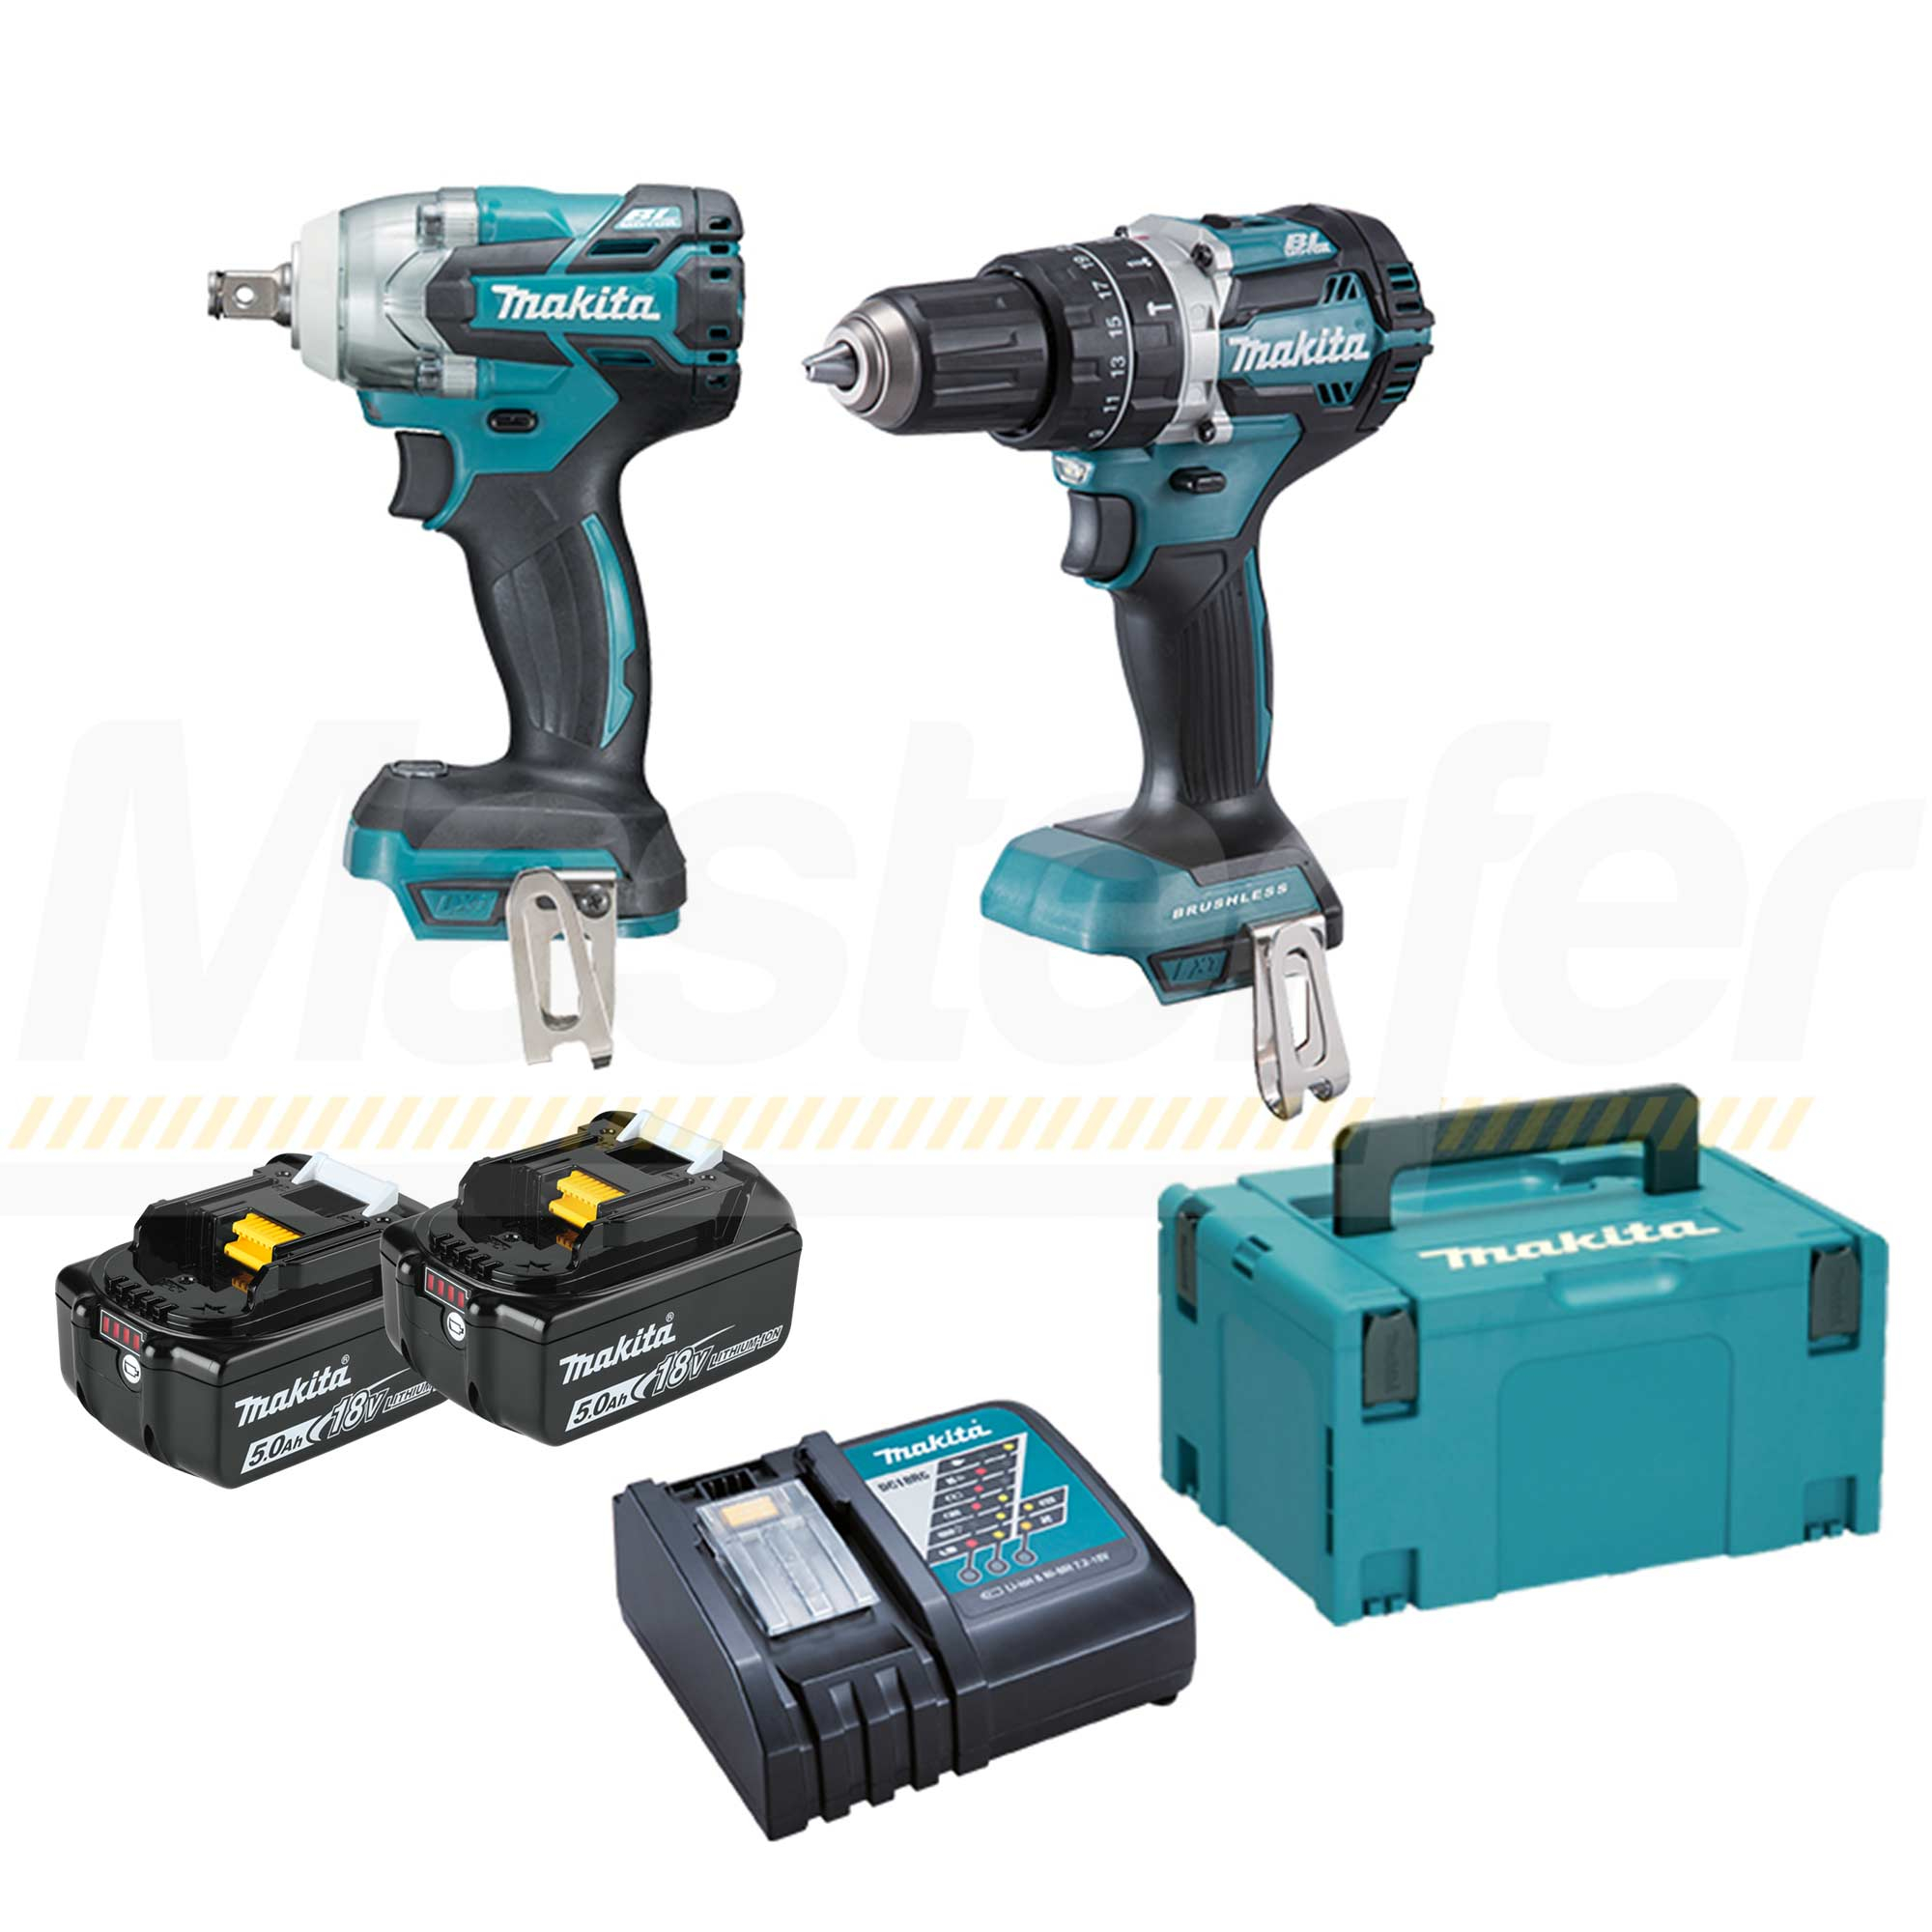 kit utensili a batteria makita dlx2250tj1